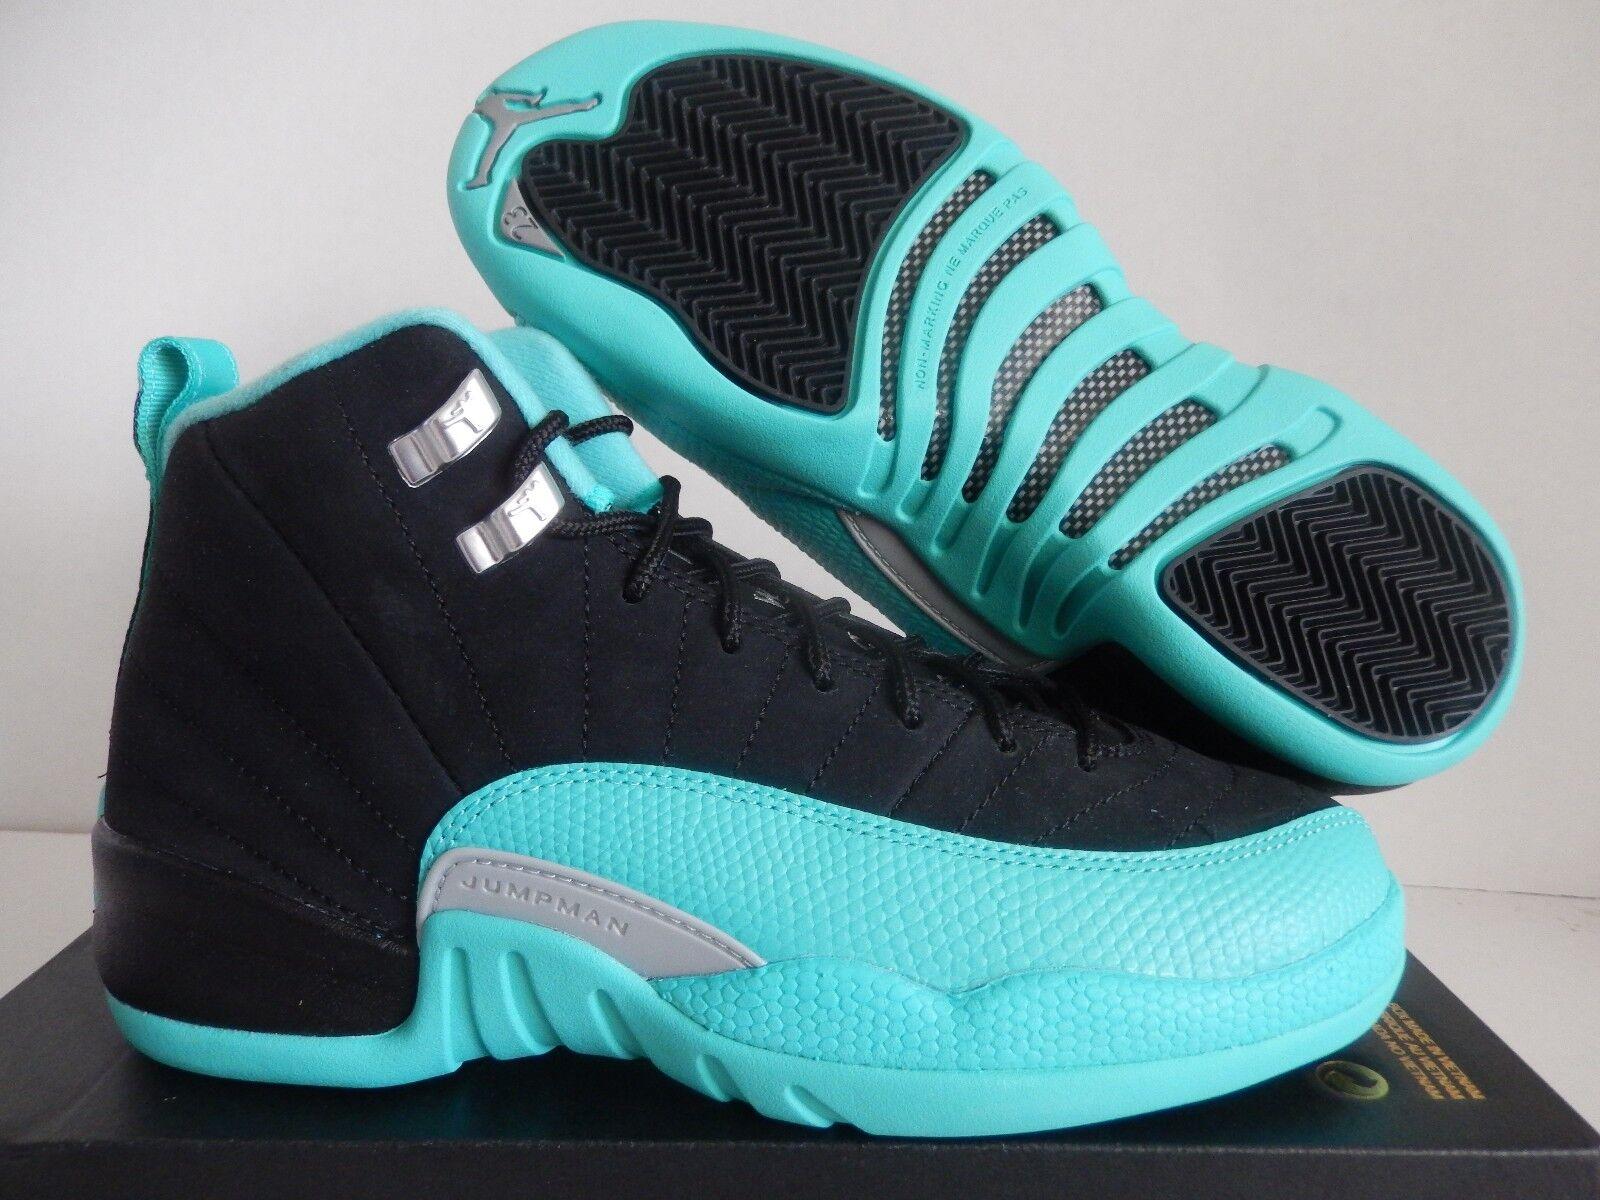 2c598539a889 Nike Air Jordan 12 XII Retro GG GS Youth HYPER Jade Black 510815-017 ...